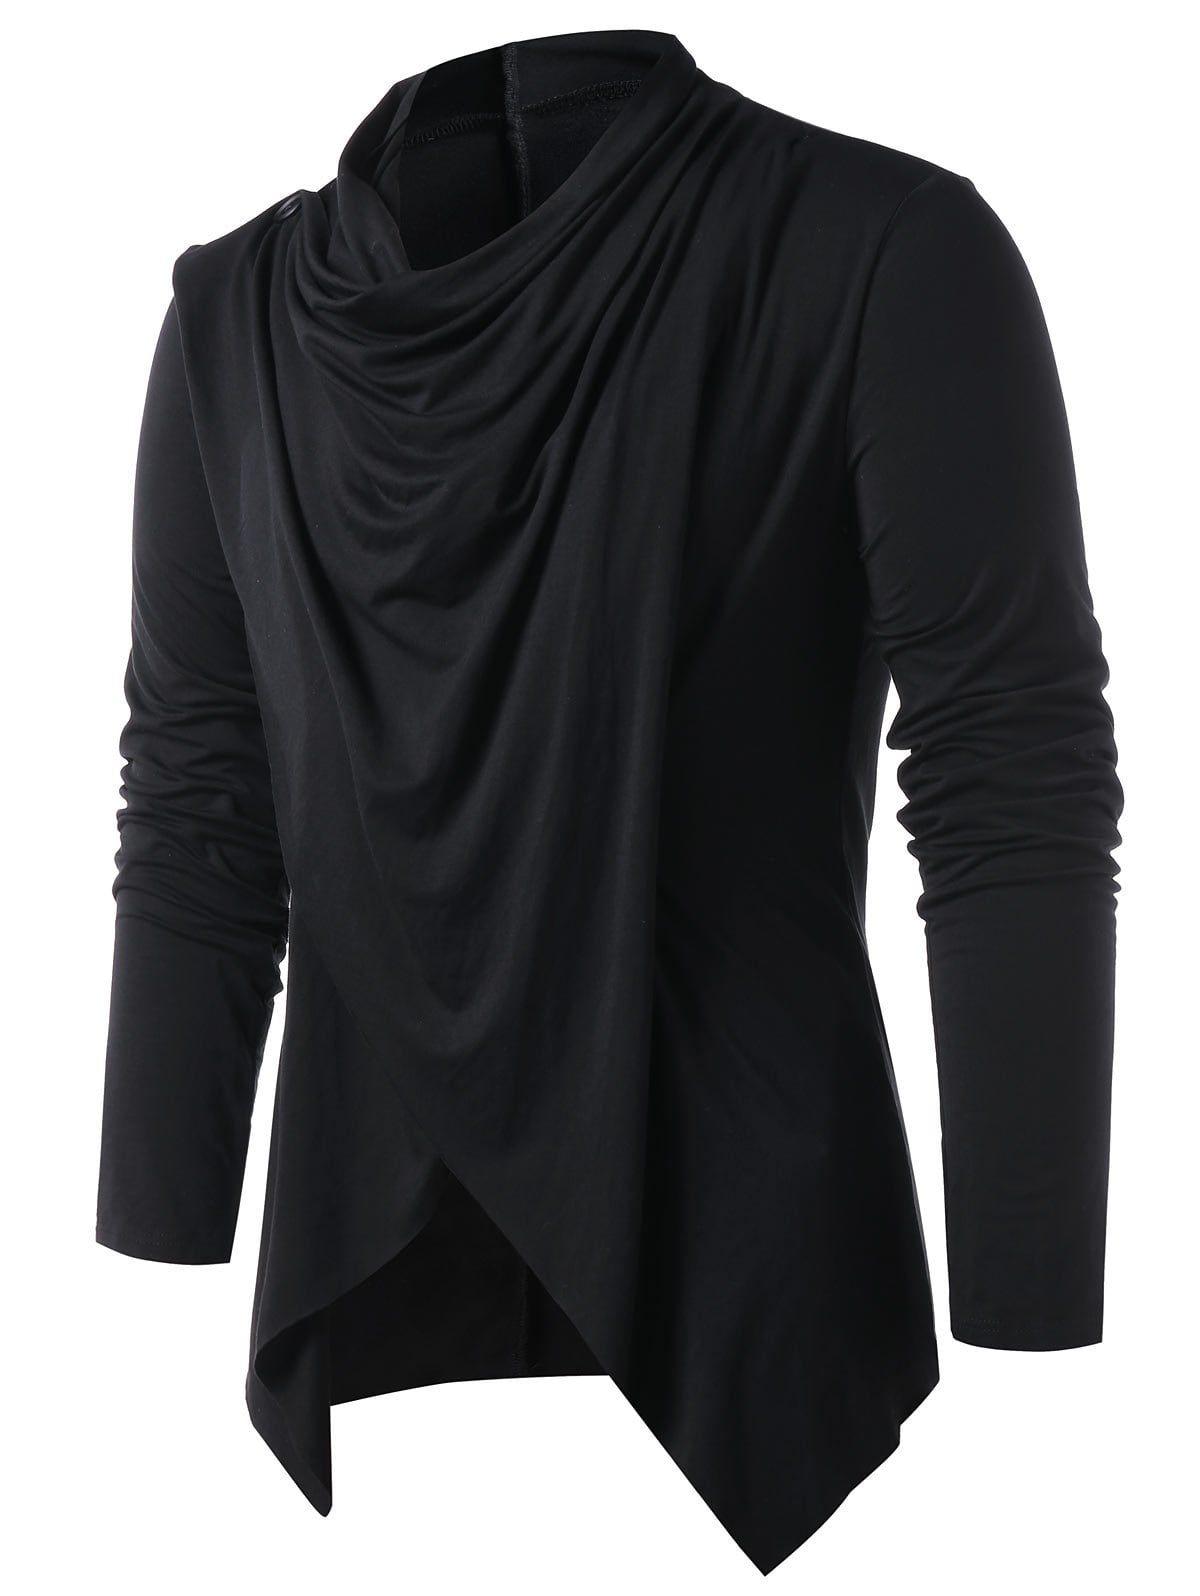 9d5a43278073be Convertible Asymmetrical Cardigan - BLACK XL